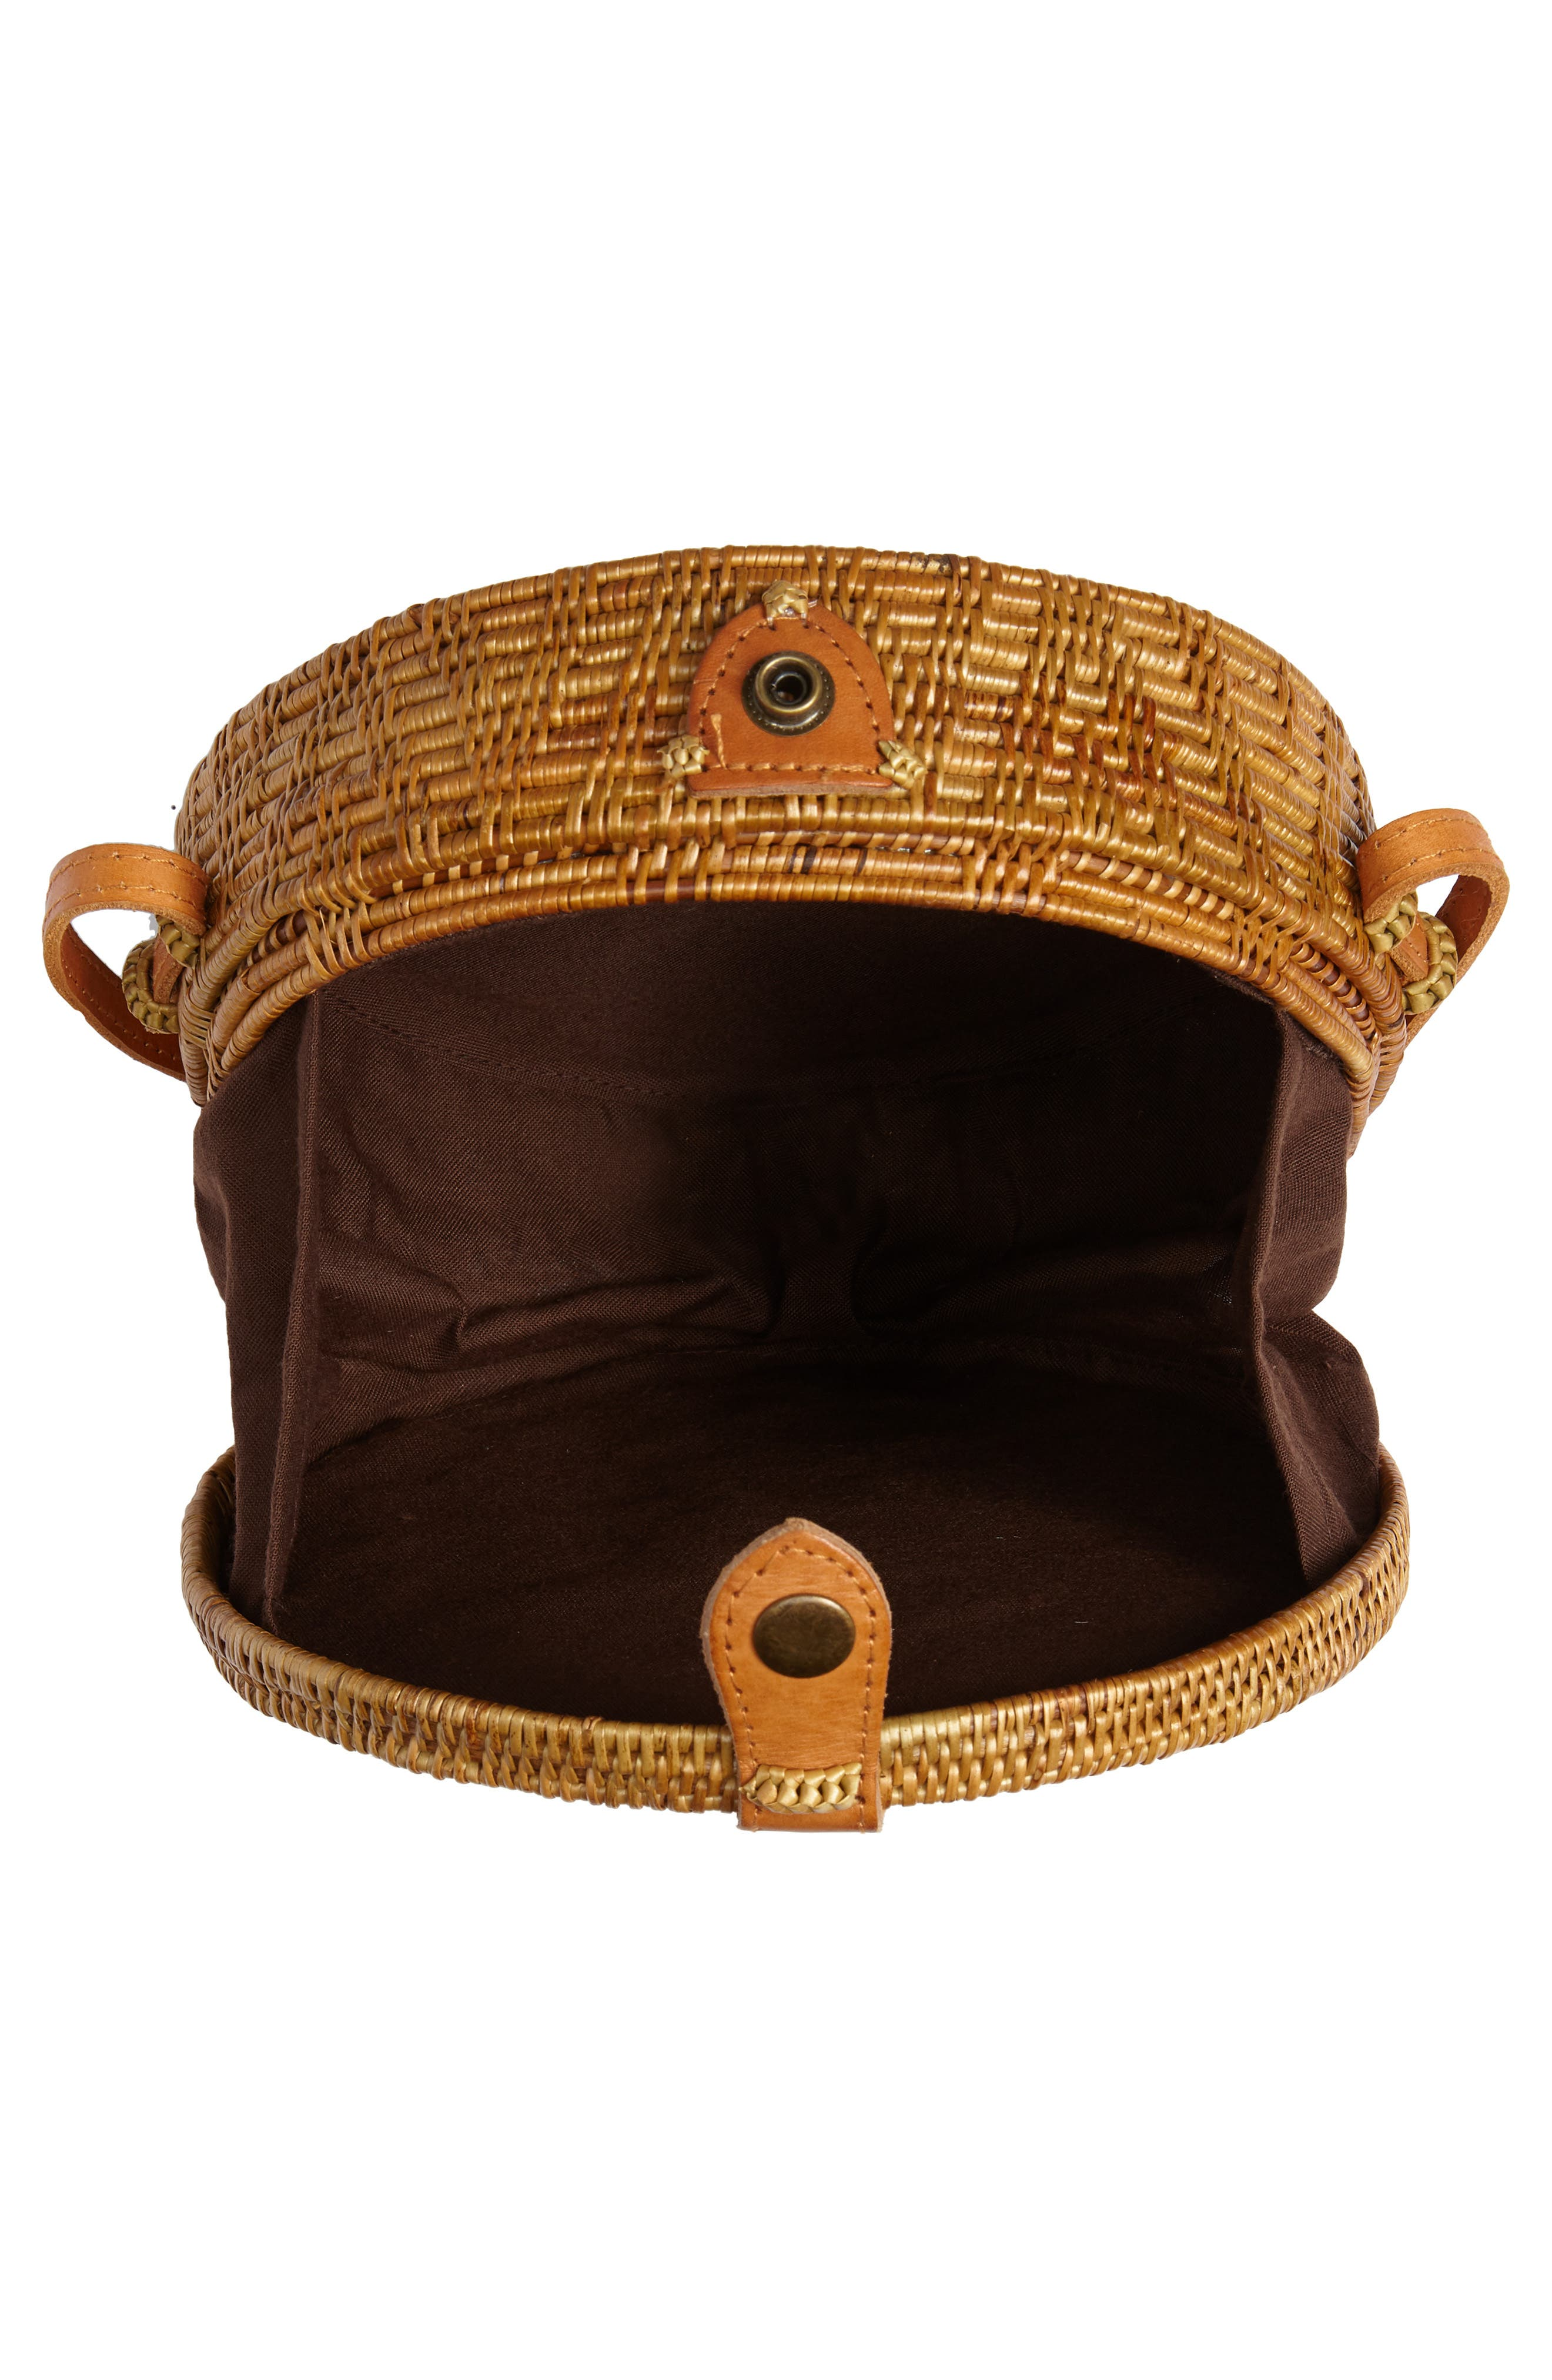 Woven Rattan Circle Basket Crossbody,                             Alternate thumbnail 4, color,                             200